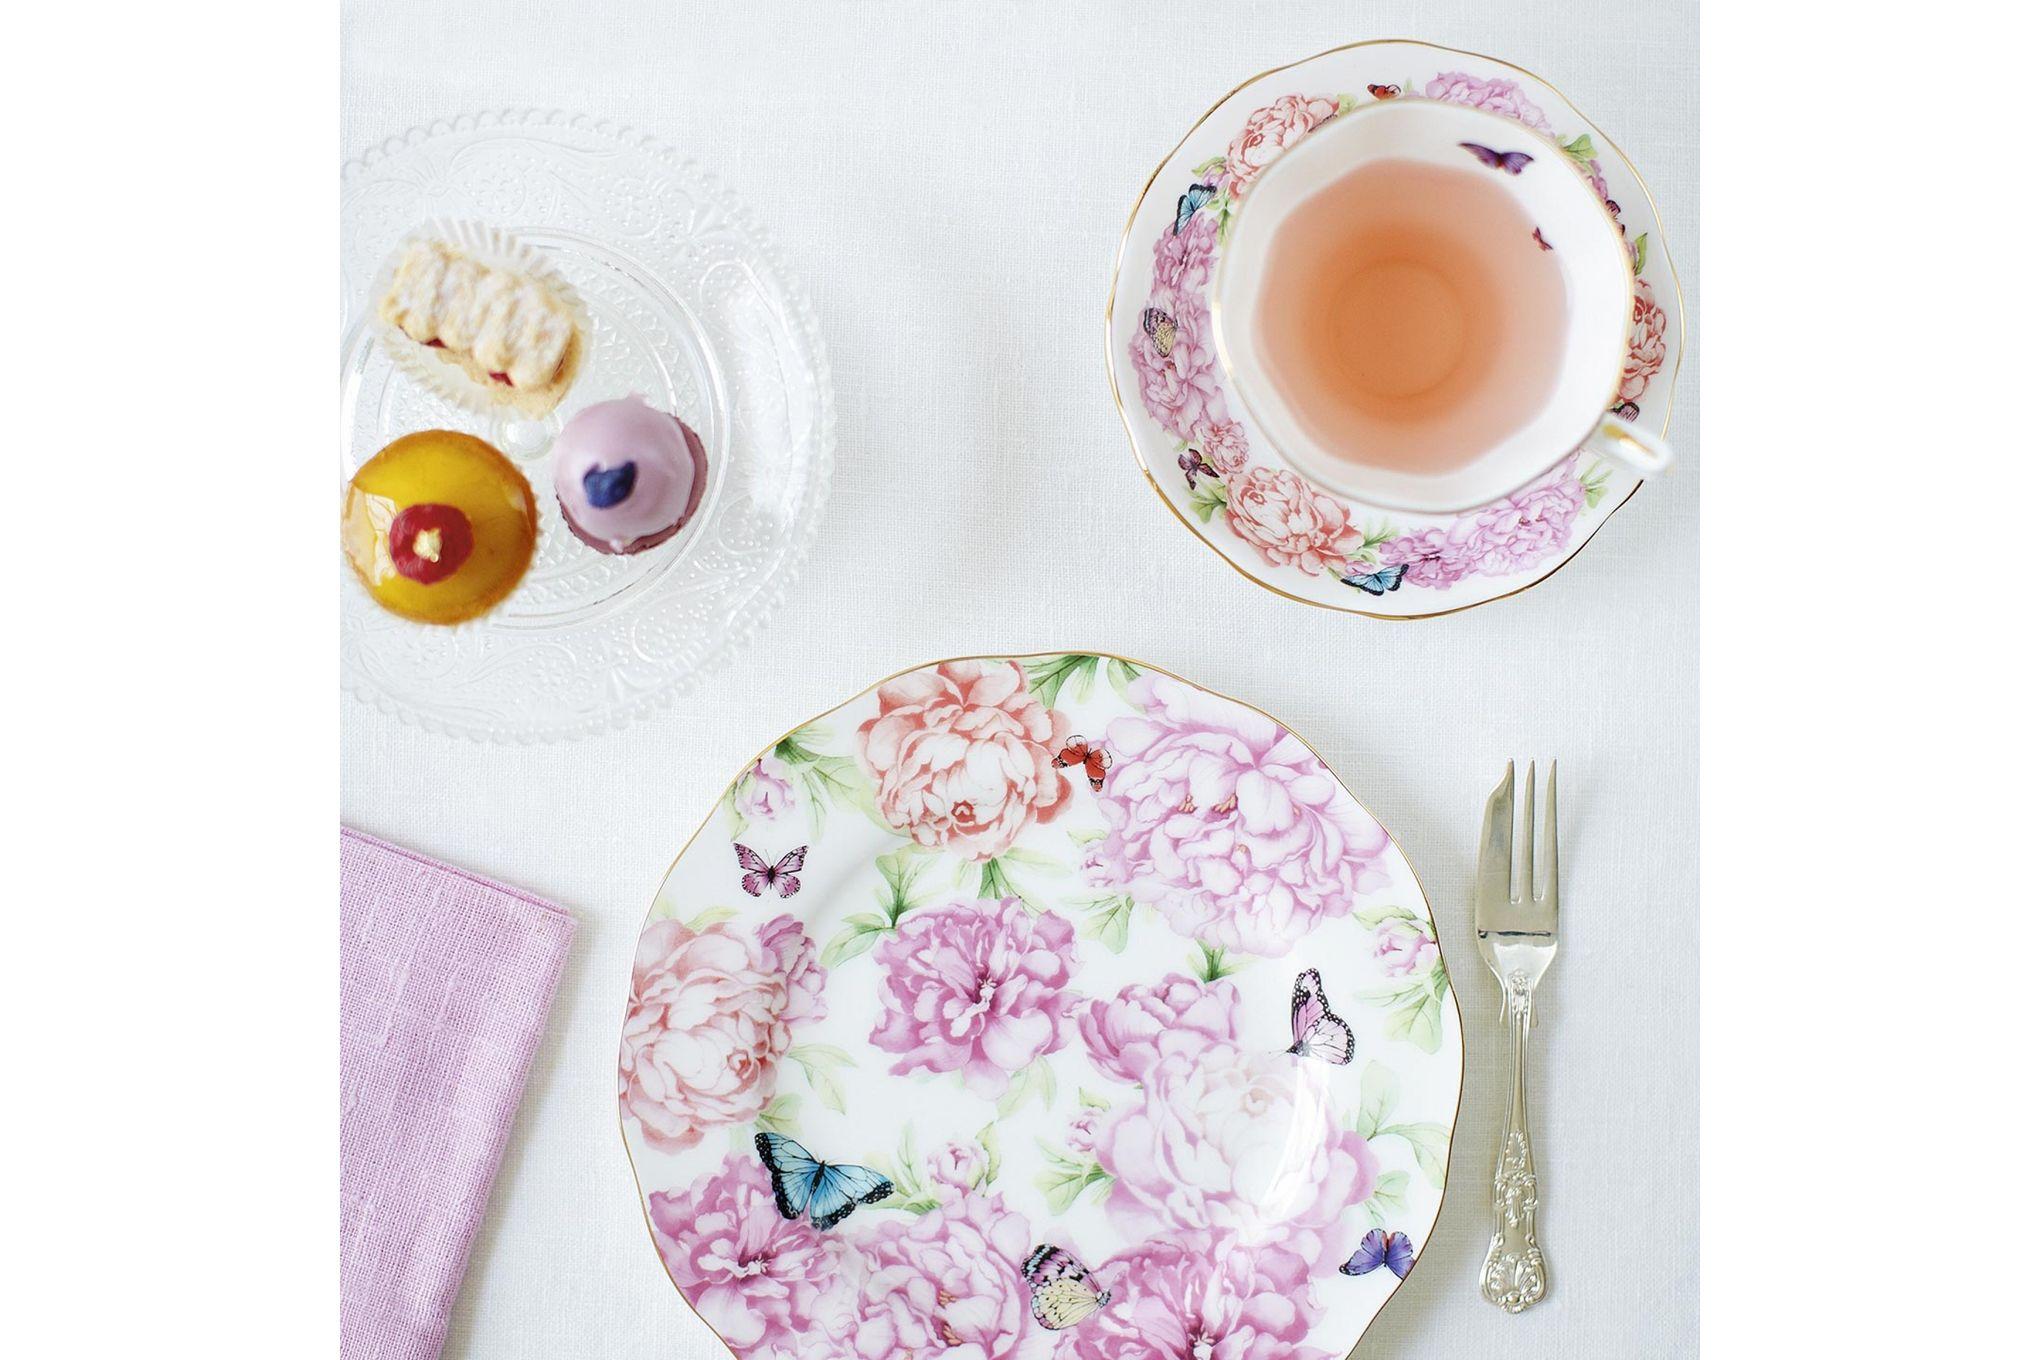 Miranda Kerr for Royal Albert Gratitude 3 Piece Set Teacup, Saucer, Plate 20cm Gratitude thumb 3